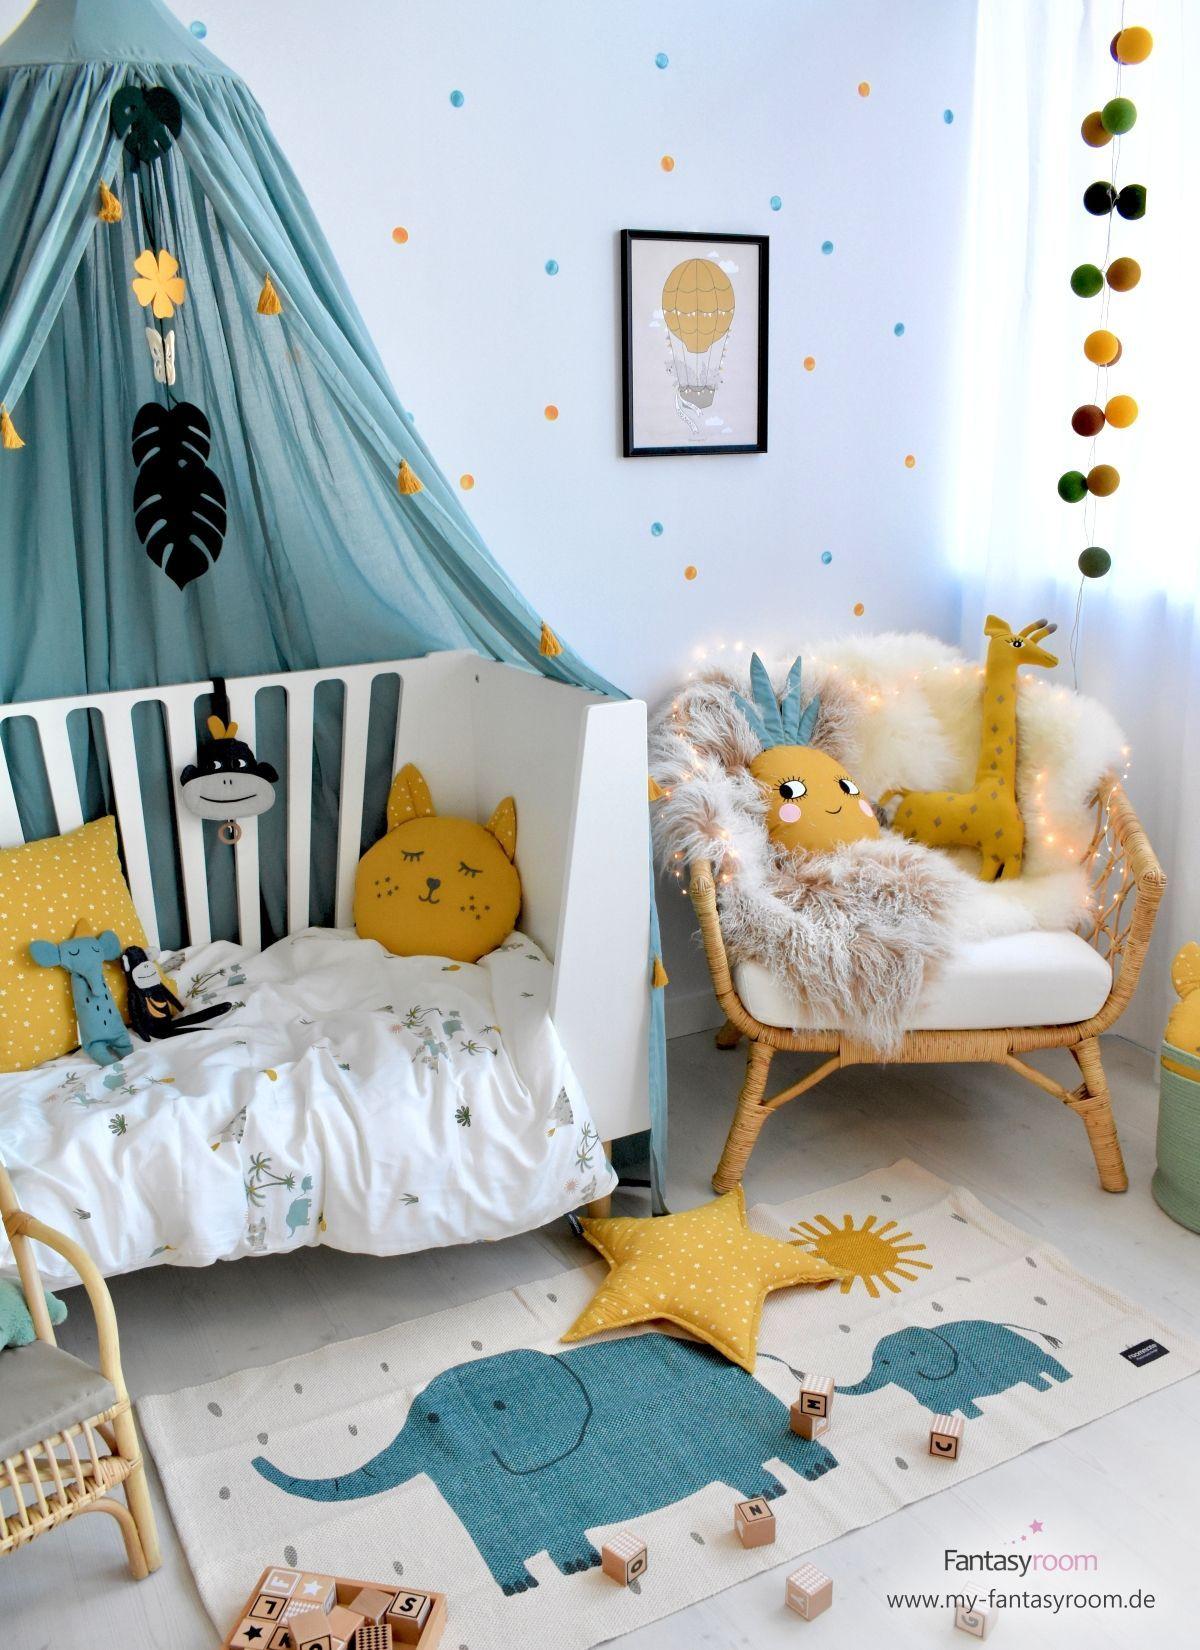 Free Tropic Look Für Kinderzimmer In 2021 Kid Room Decor Nursery Room Decor Baby Boy Rooms